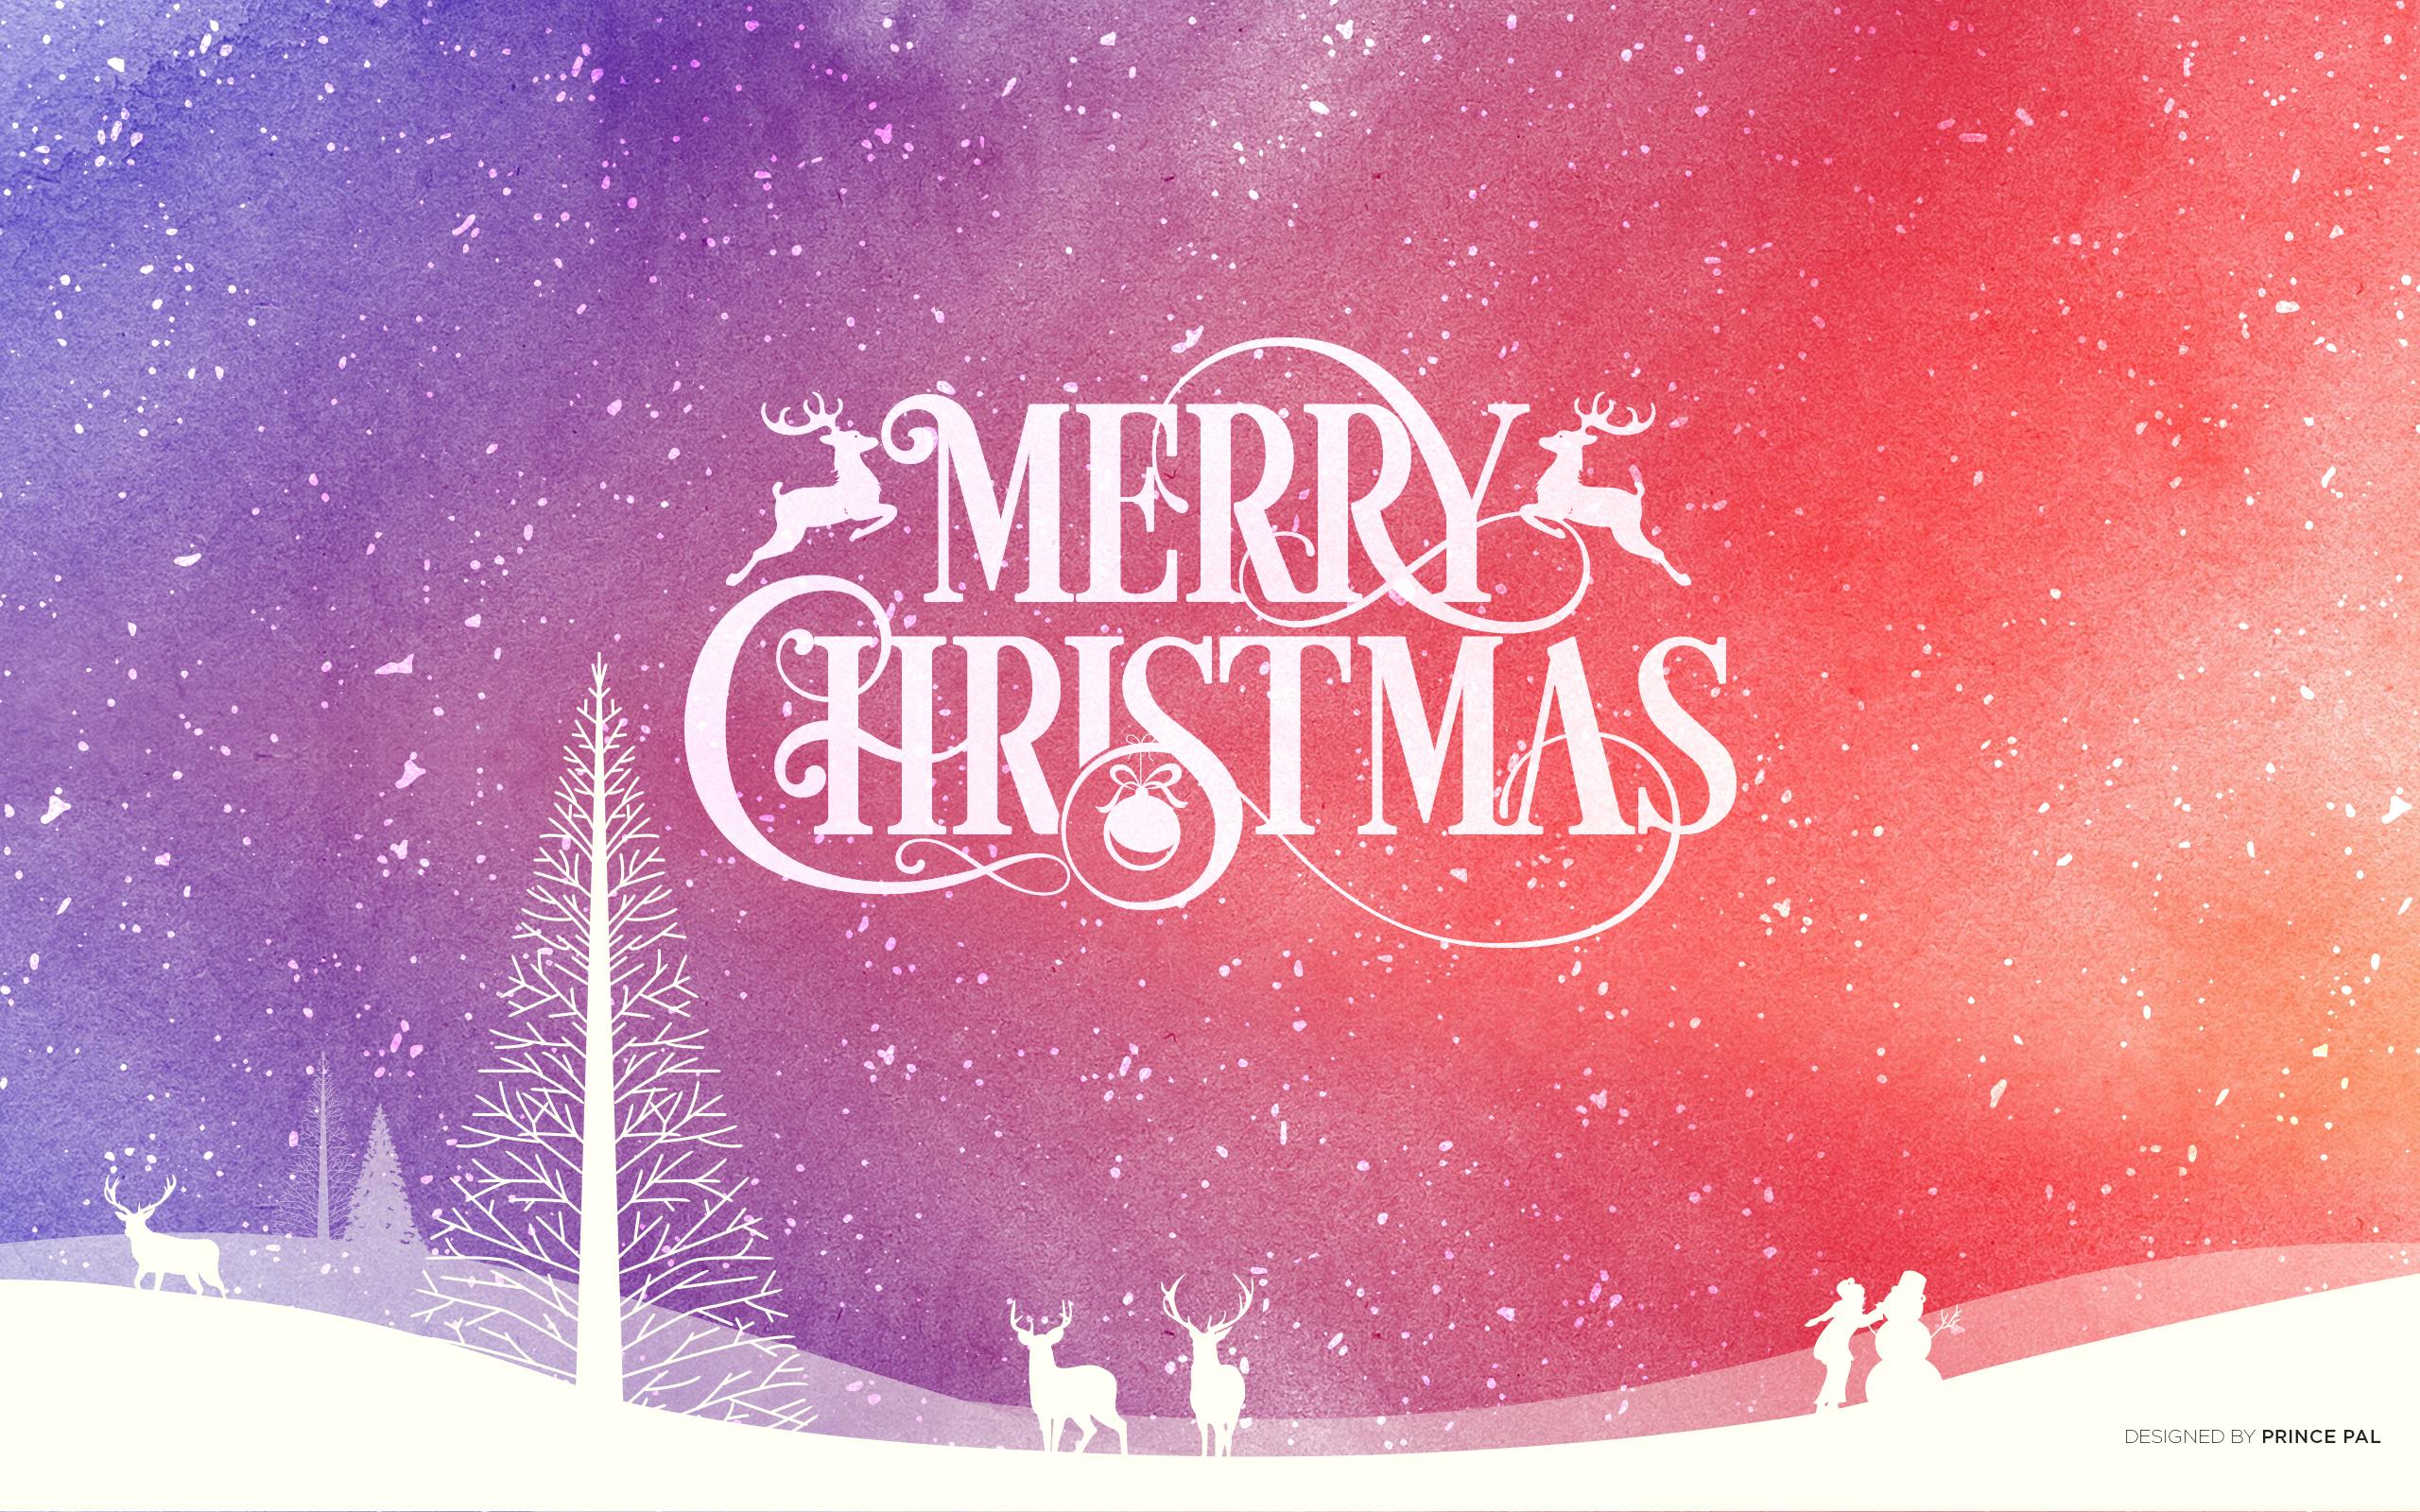 Wallpaper Christmas.Christmas Wallpaper Christmas Wallpaper 2014 15970